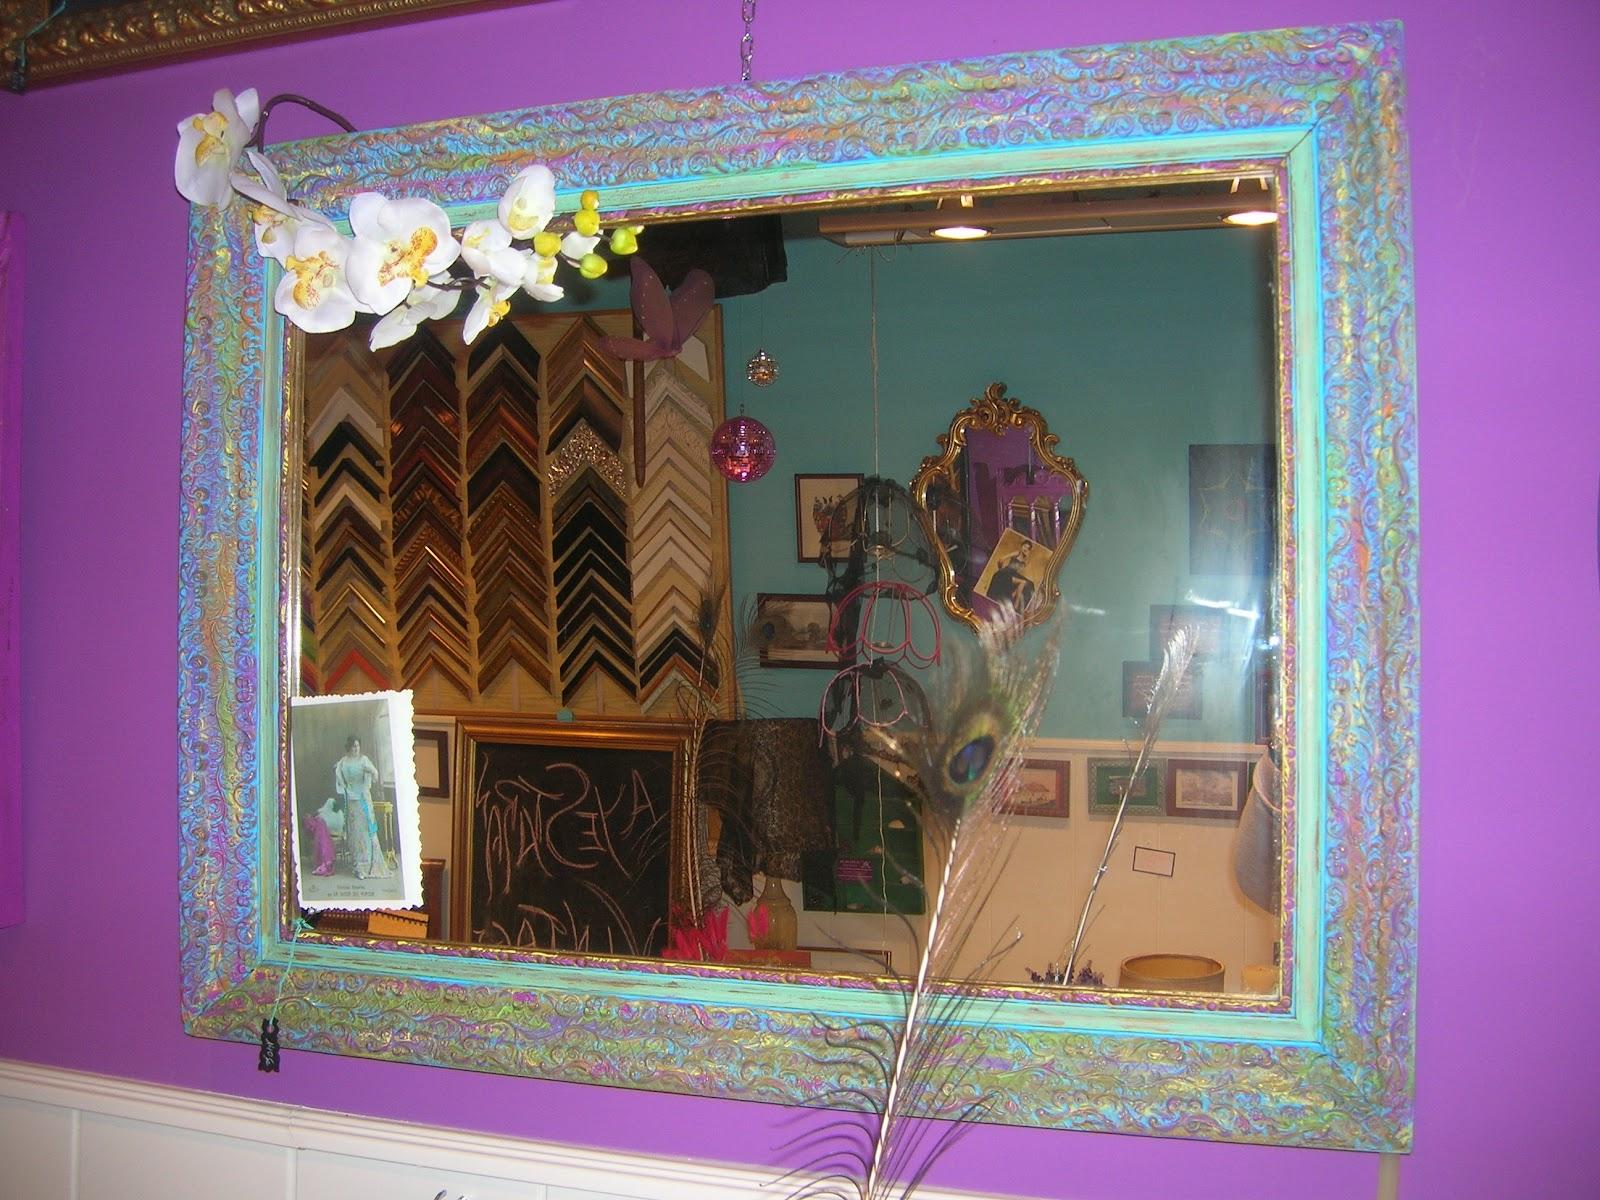 Como decorar un espejo sin marco imagui for Como decorar un espejo rectangular sin marco